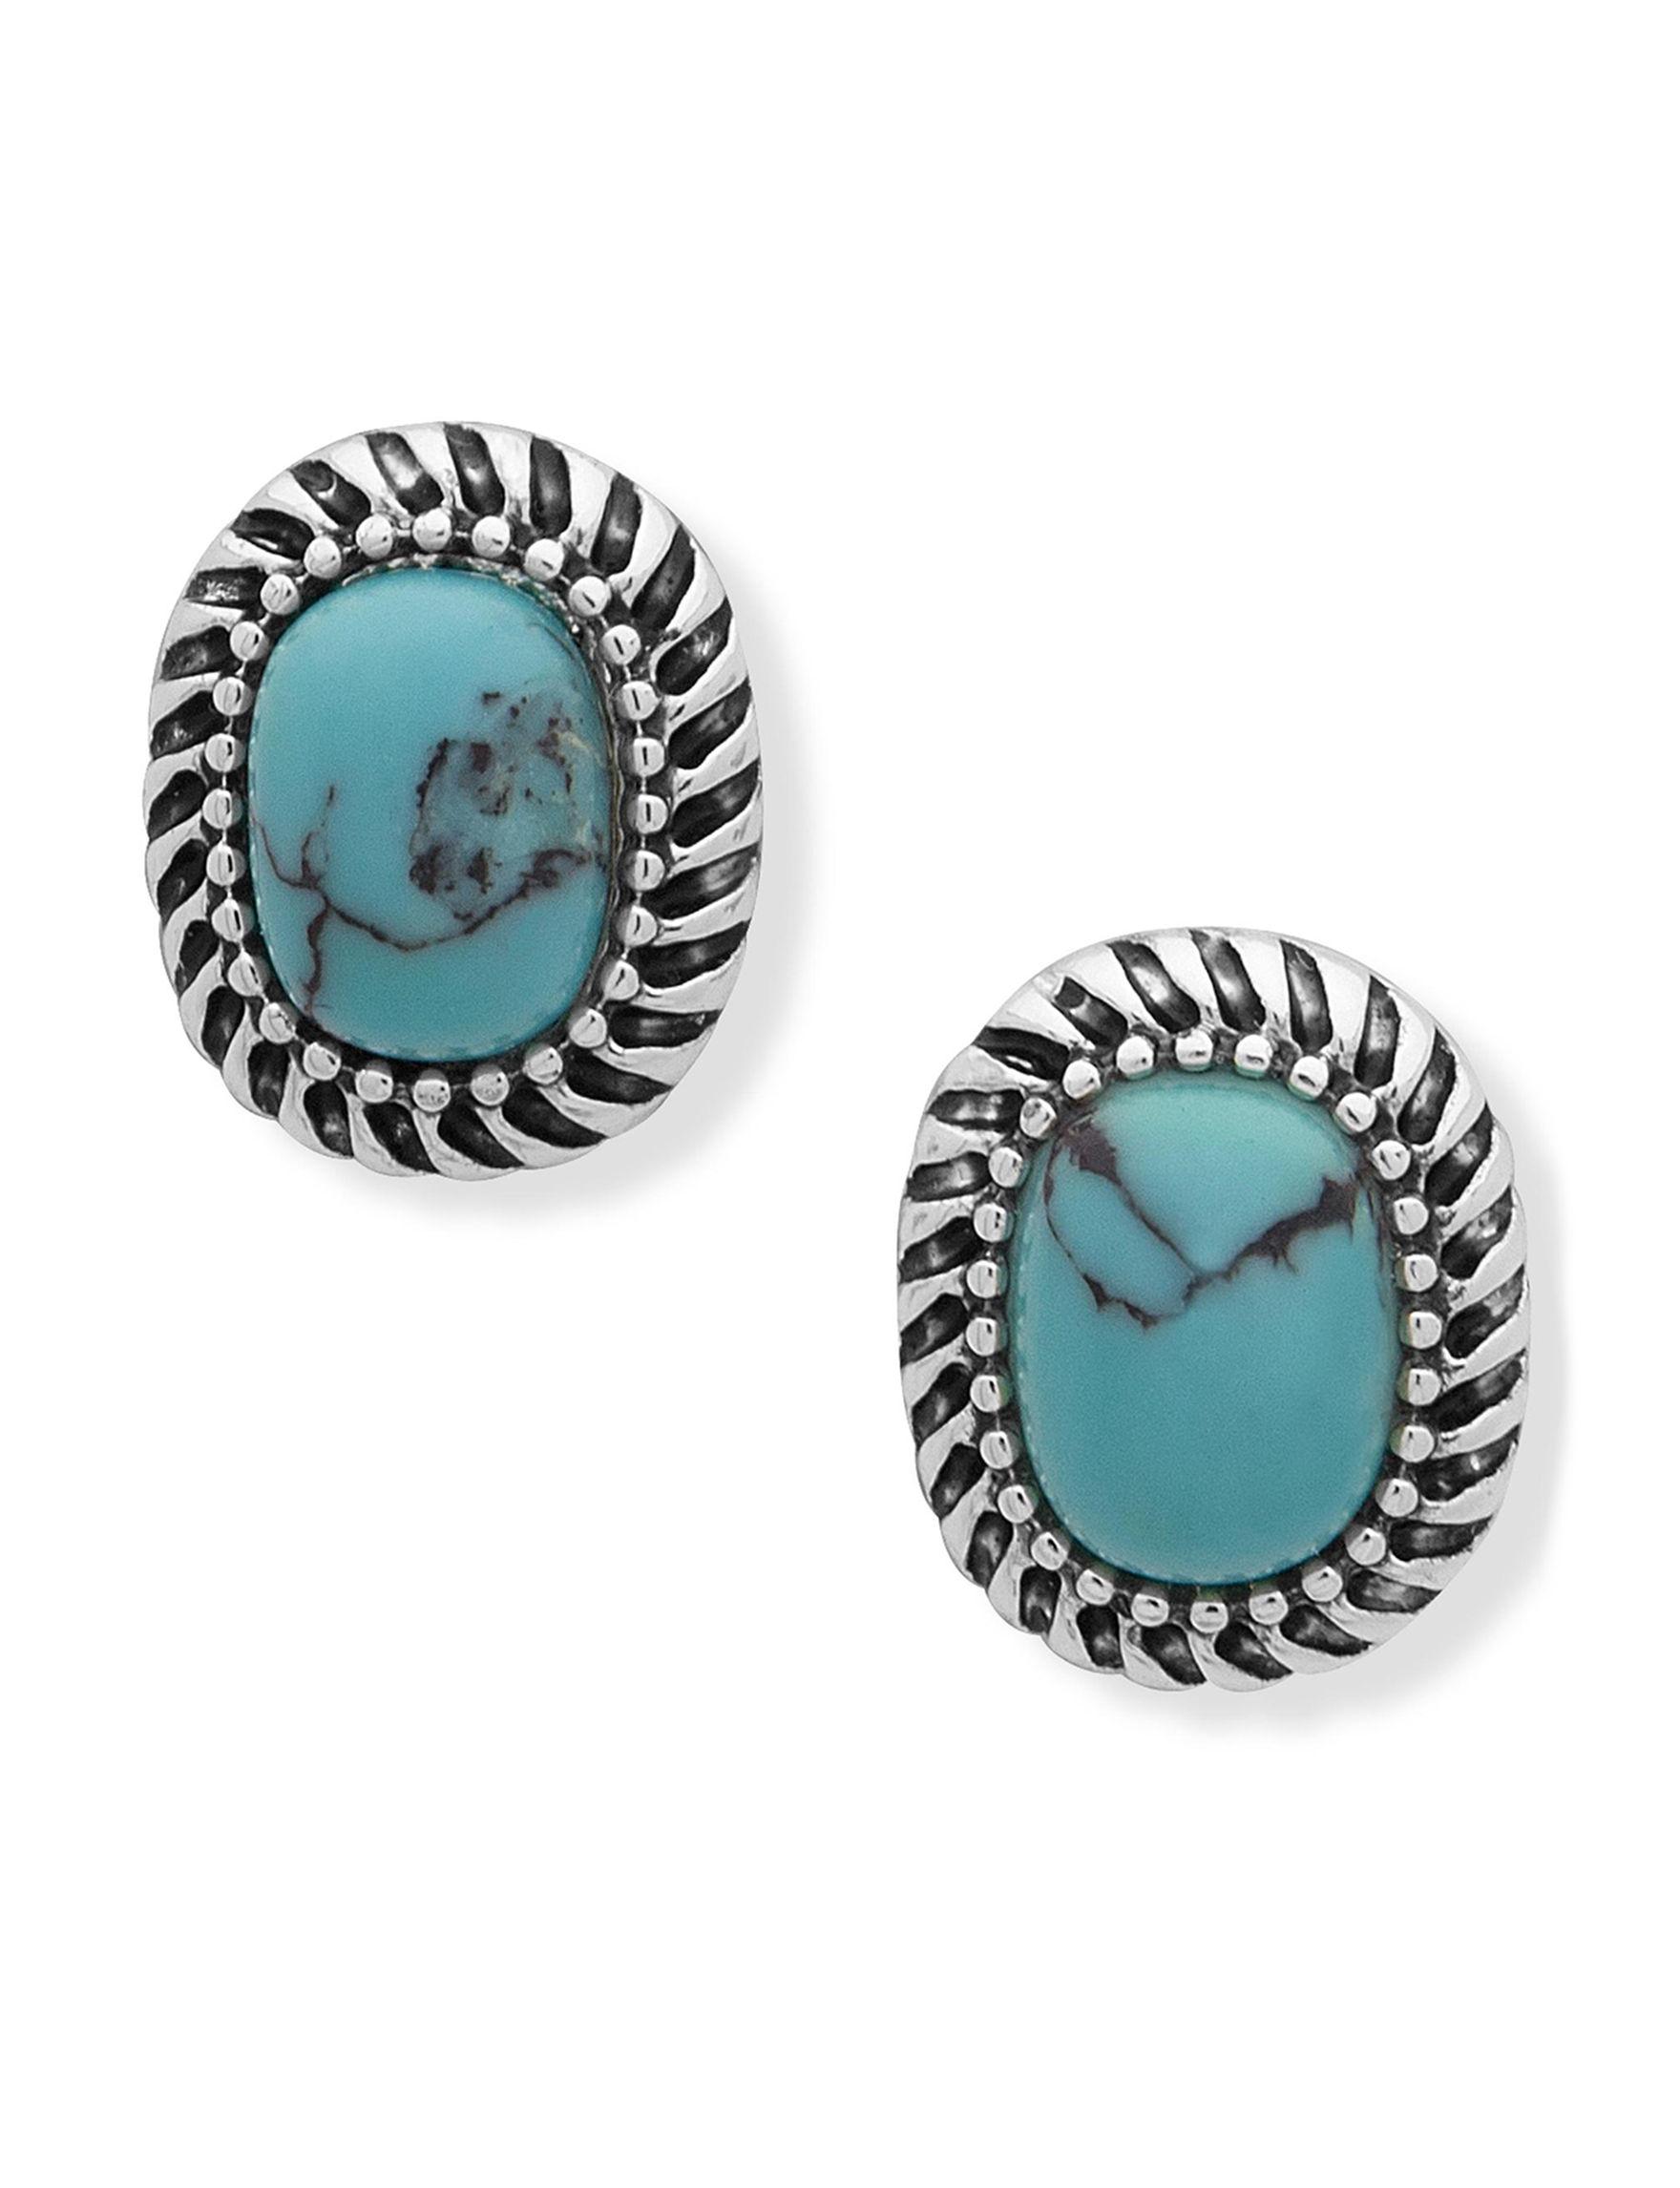 Chaps Blue / Silver Studs Earrings Fashion Jewelry